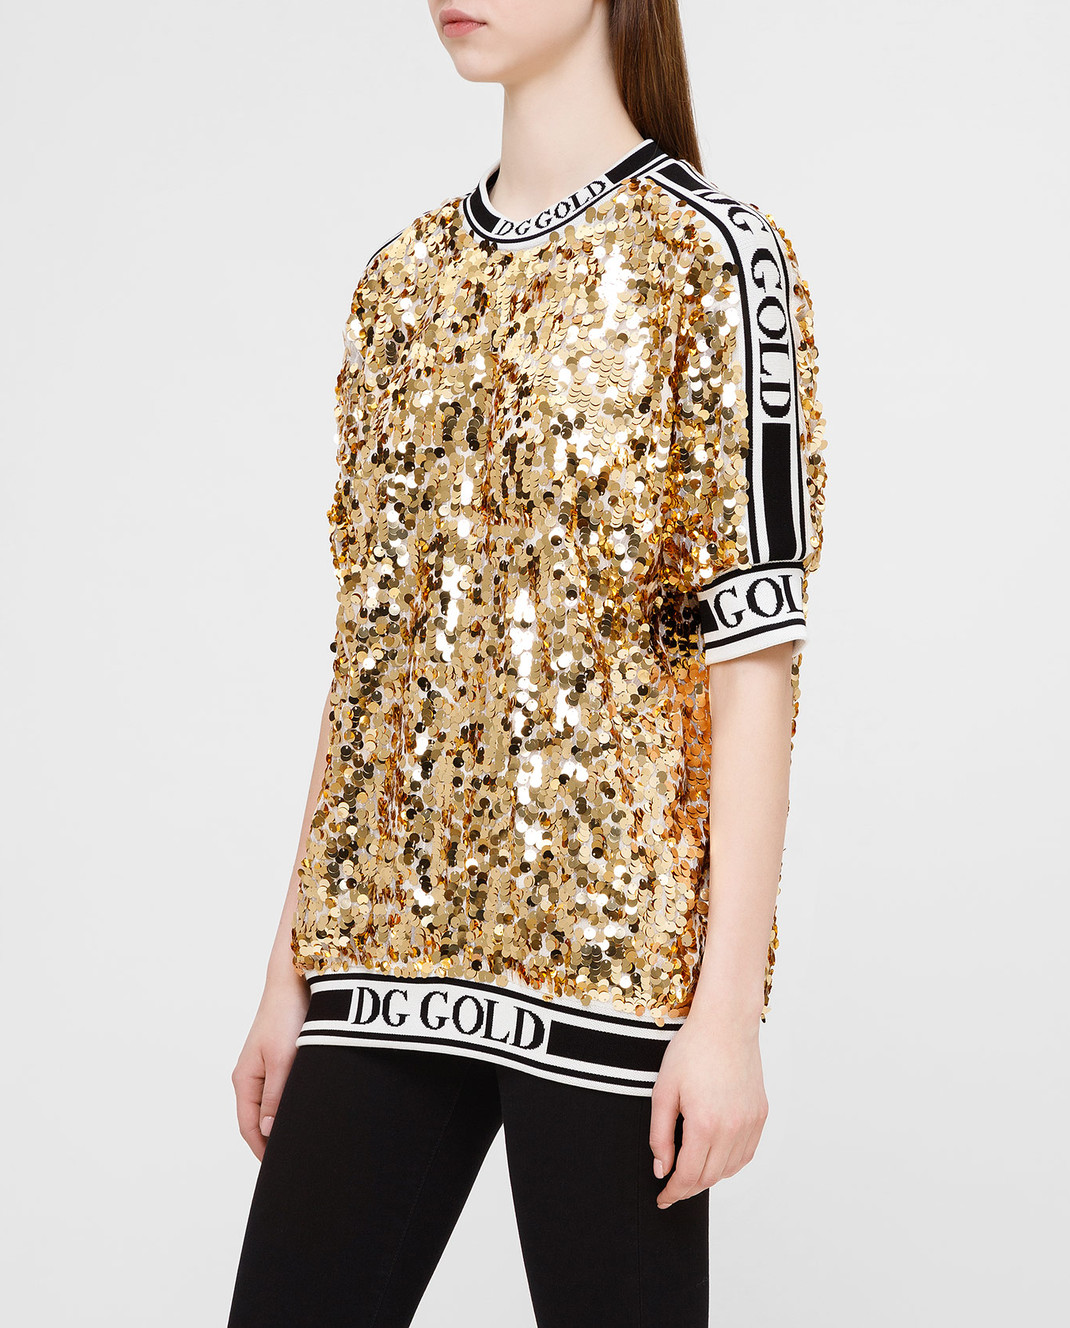 Dolce&Gabbana Золотистая футболка изображение 3